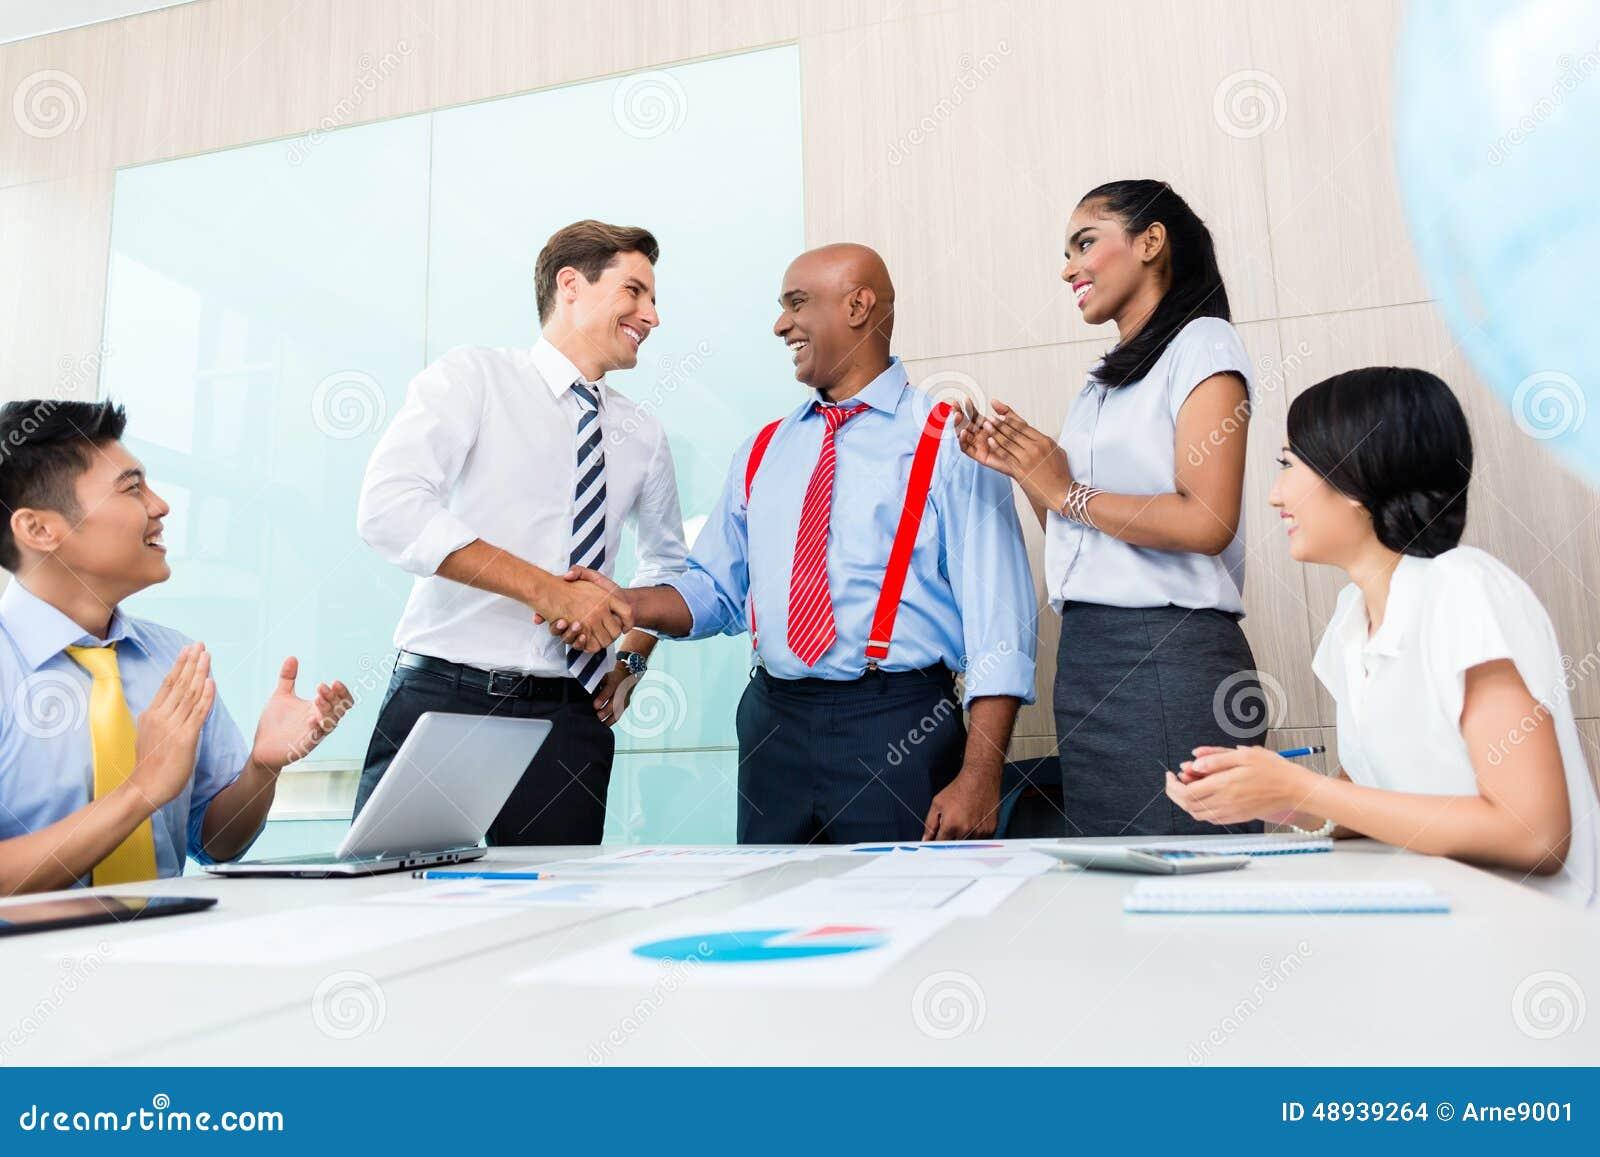 Managing Groups and Teams/Diversity